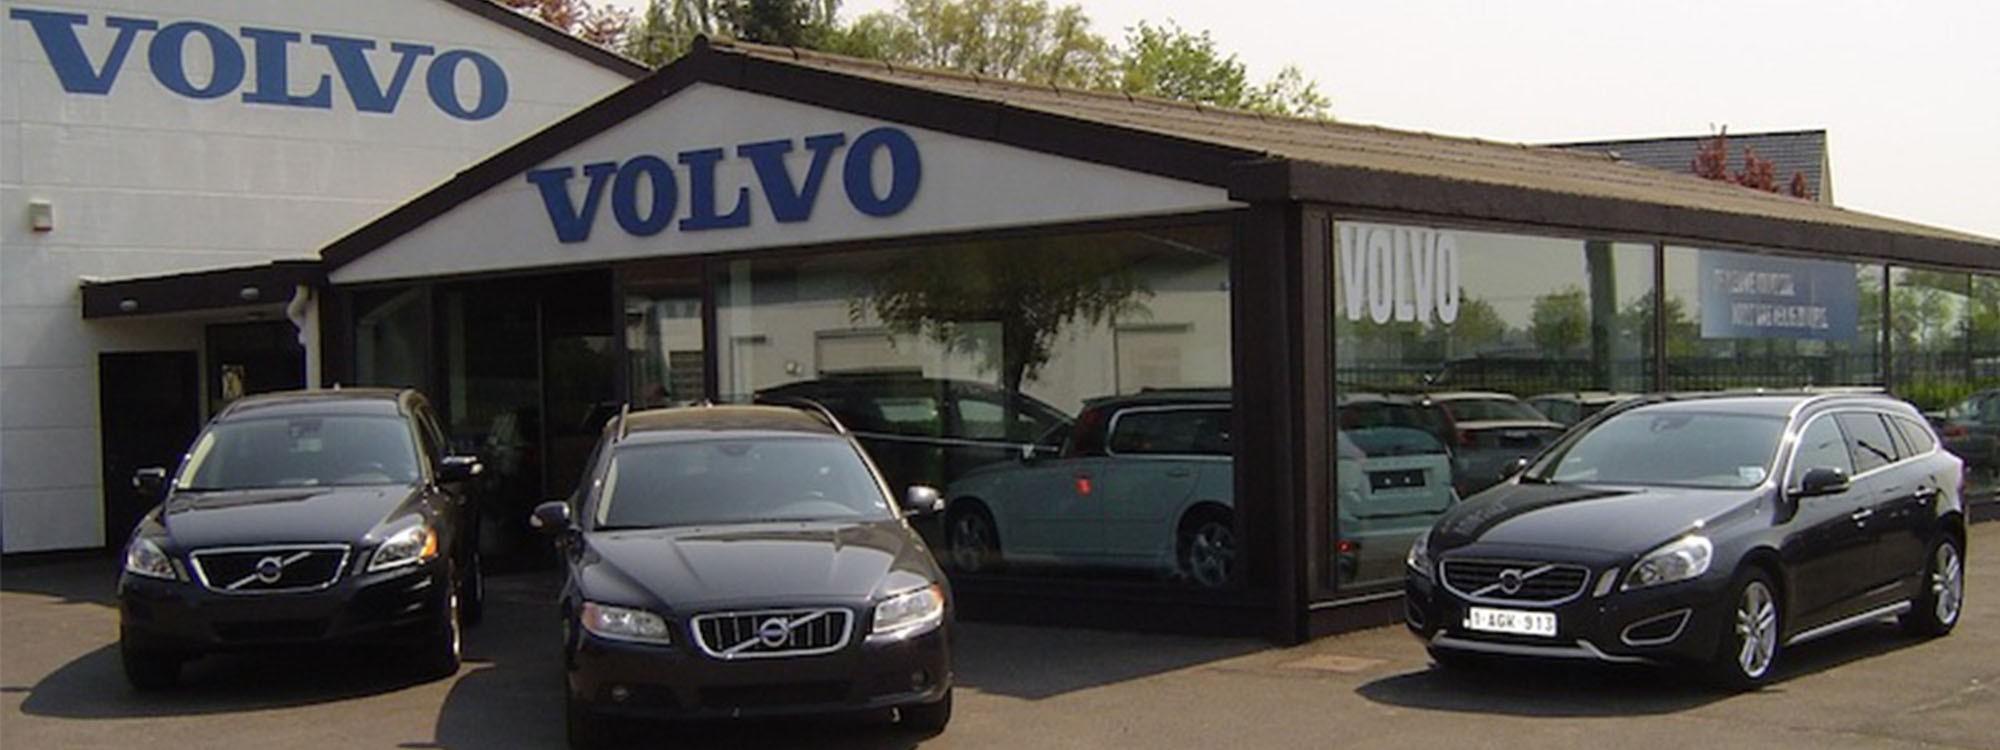 Garage De Pauw Pascal - Volvo Maldegem - Inforegio.be